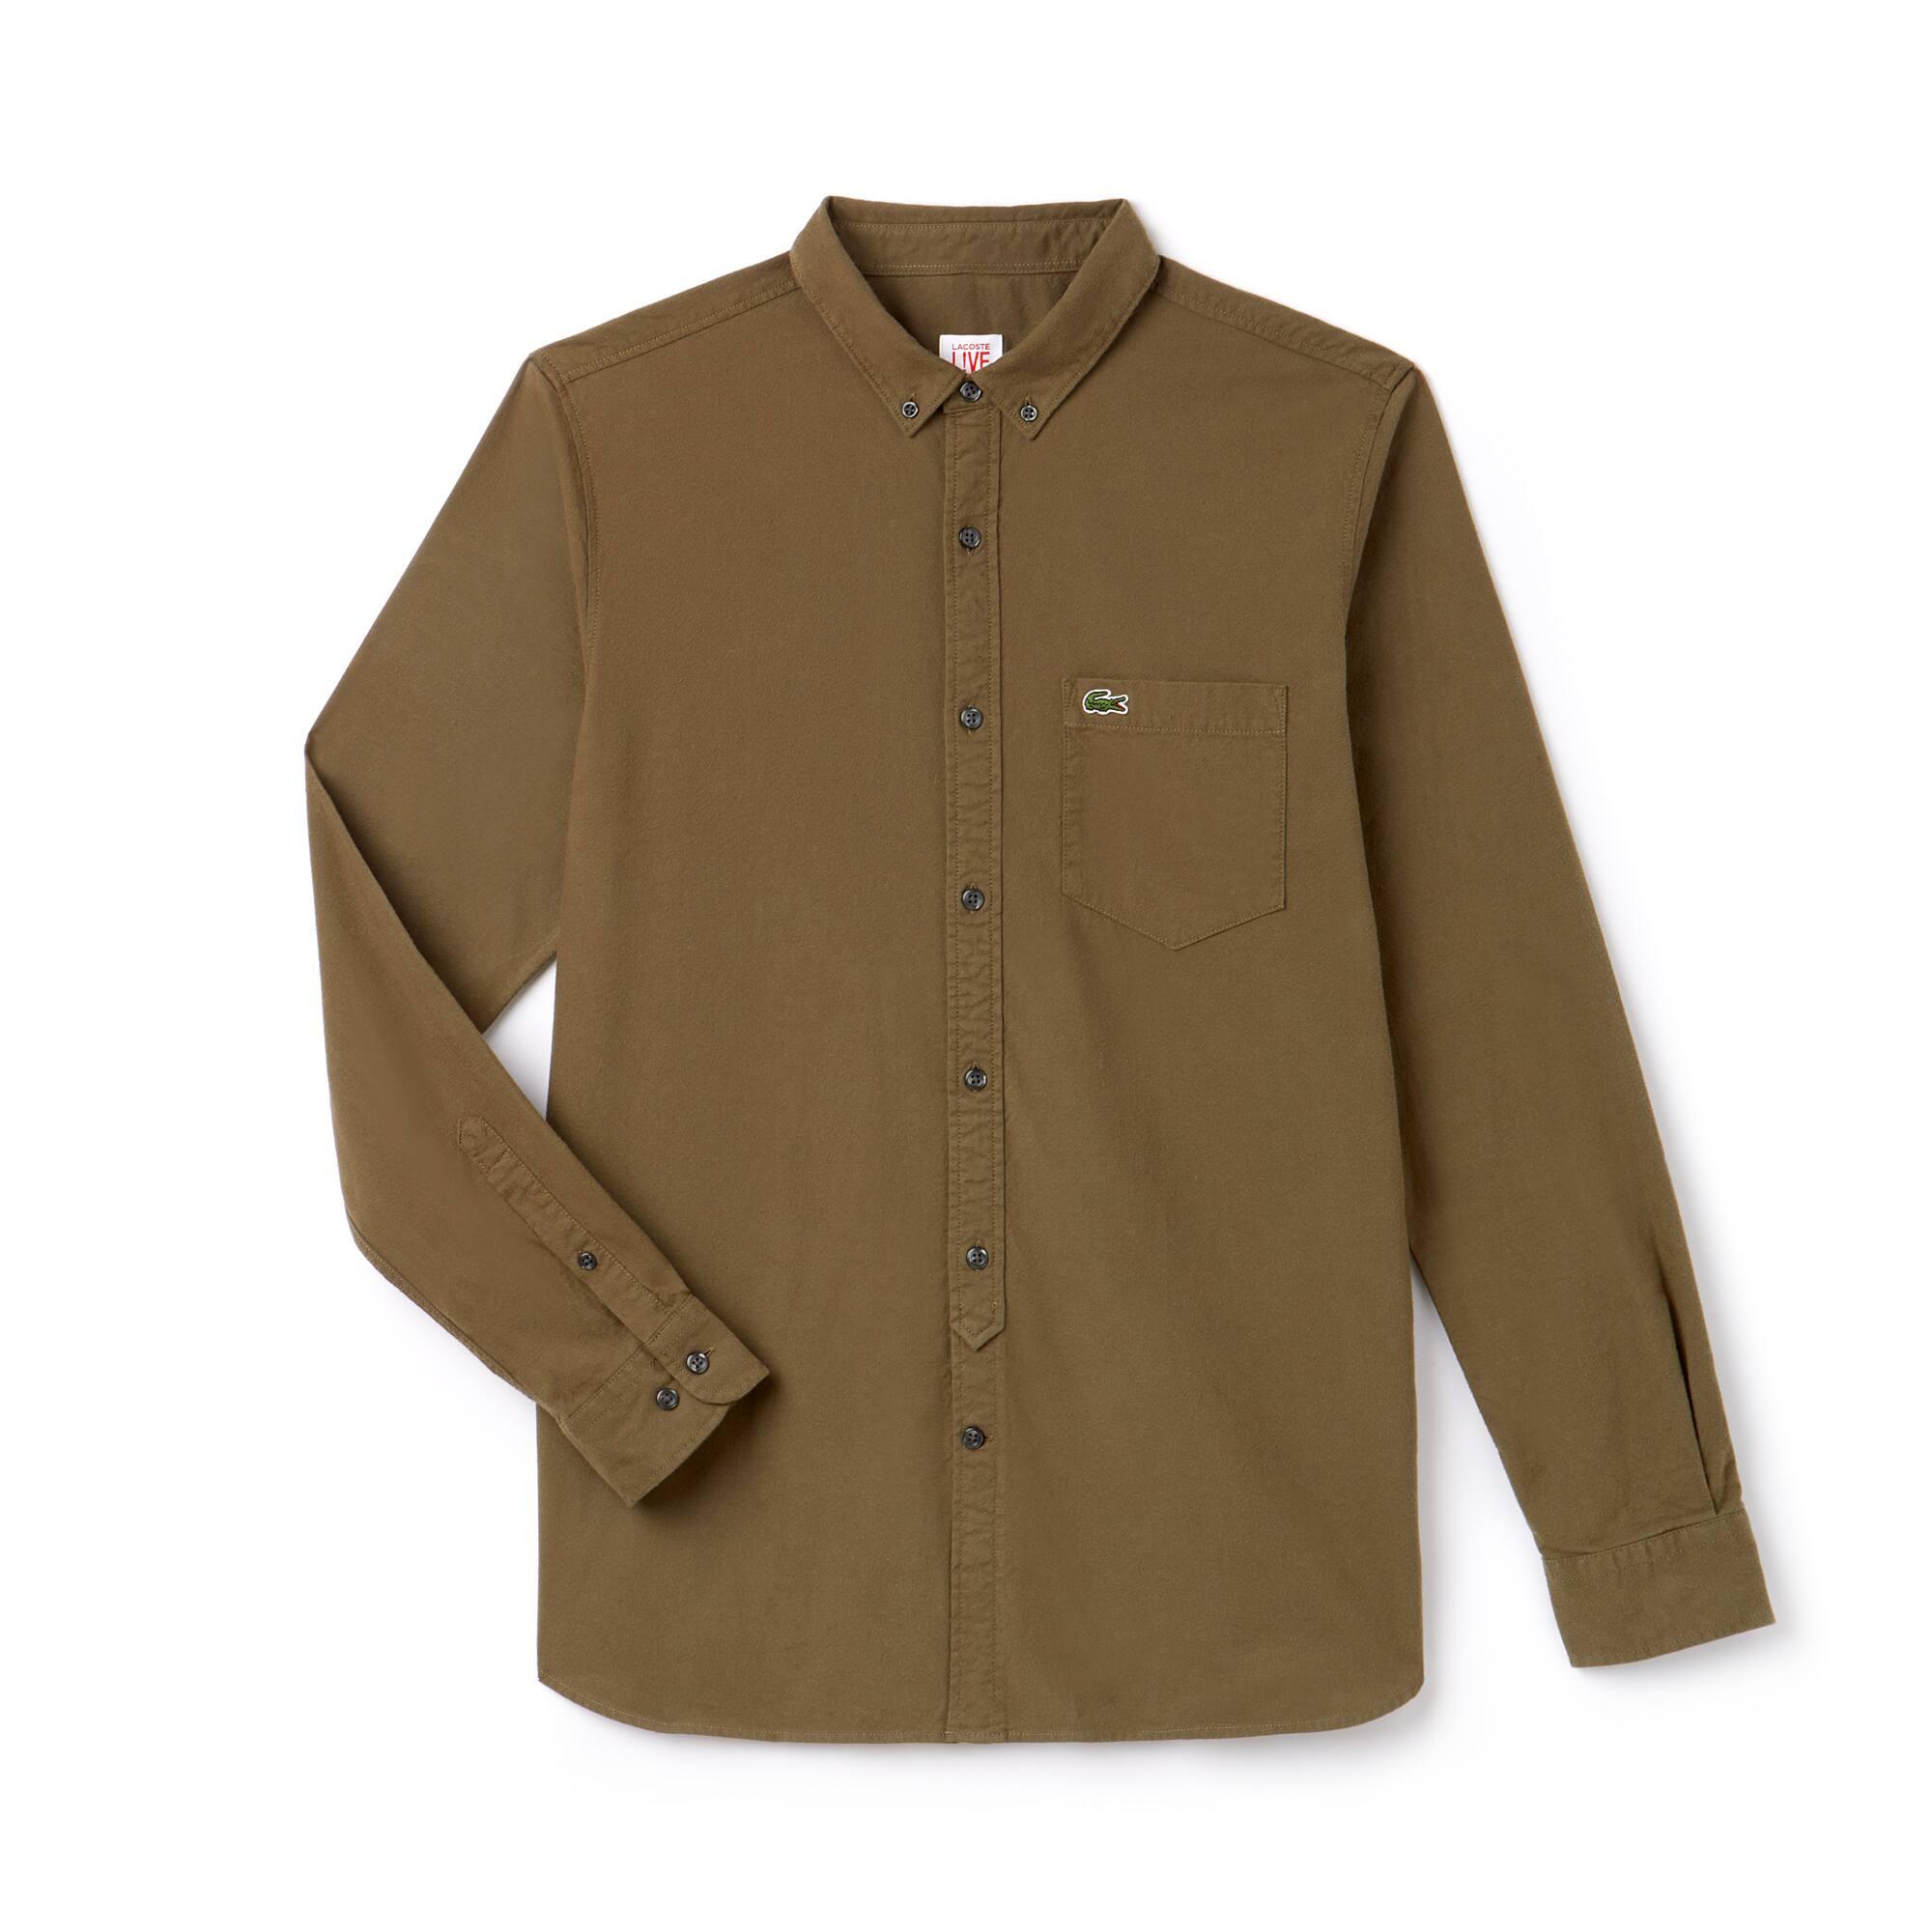 Skinny Fit Herren-Hemd aus Oxford-Baumwolle LACOSTE L!VE